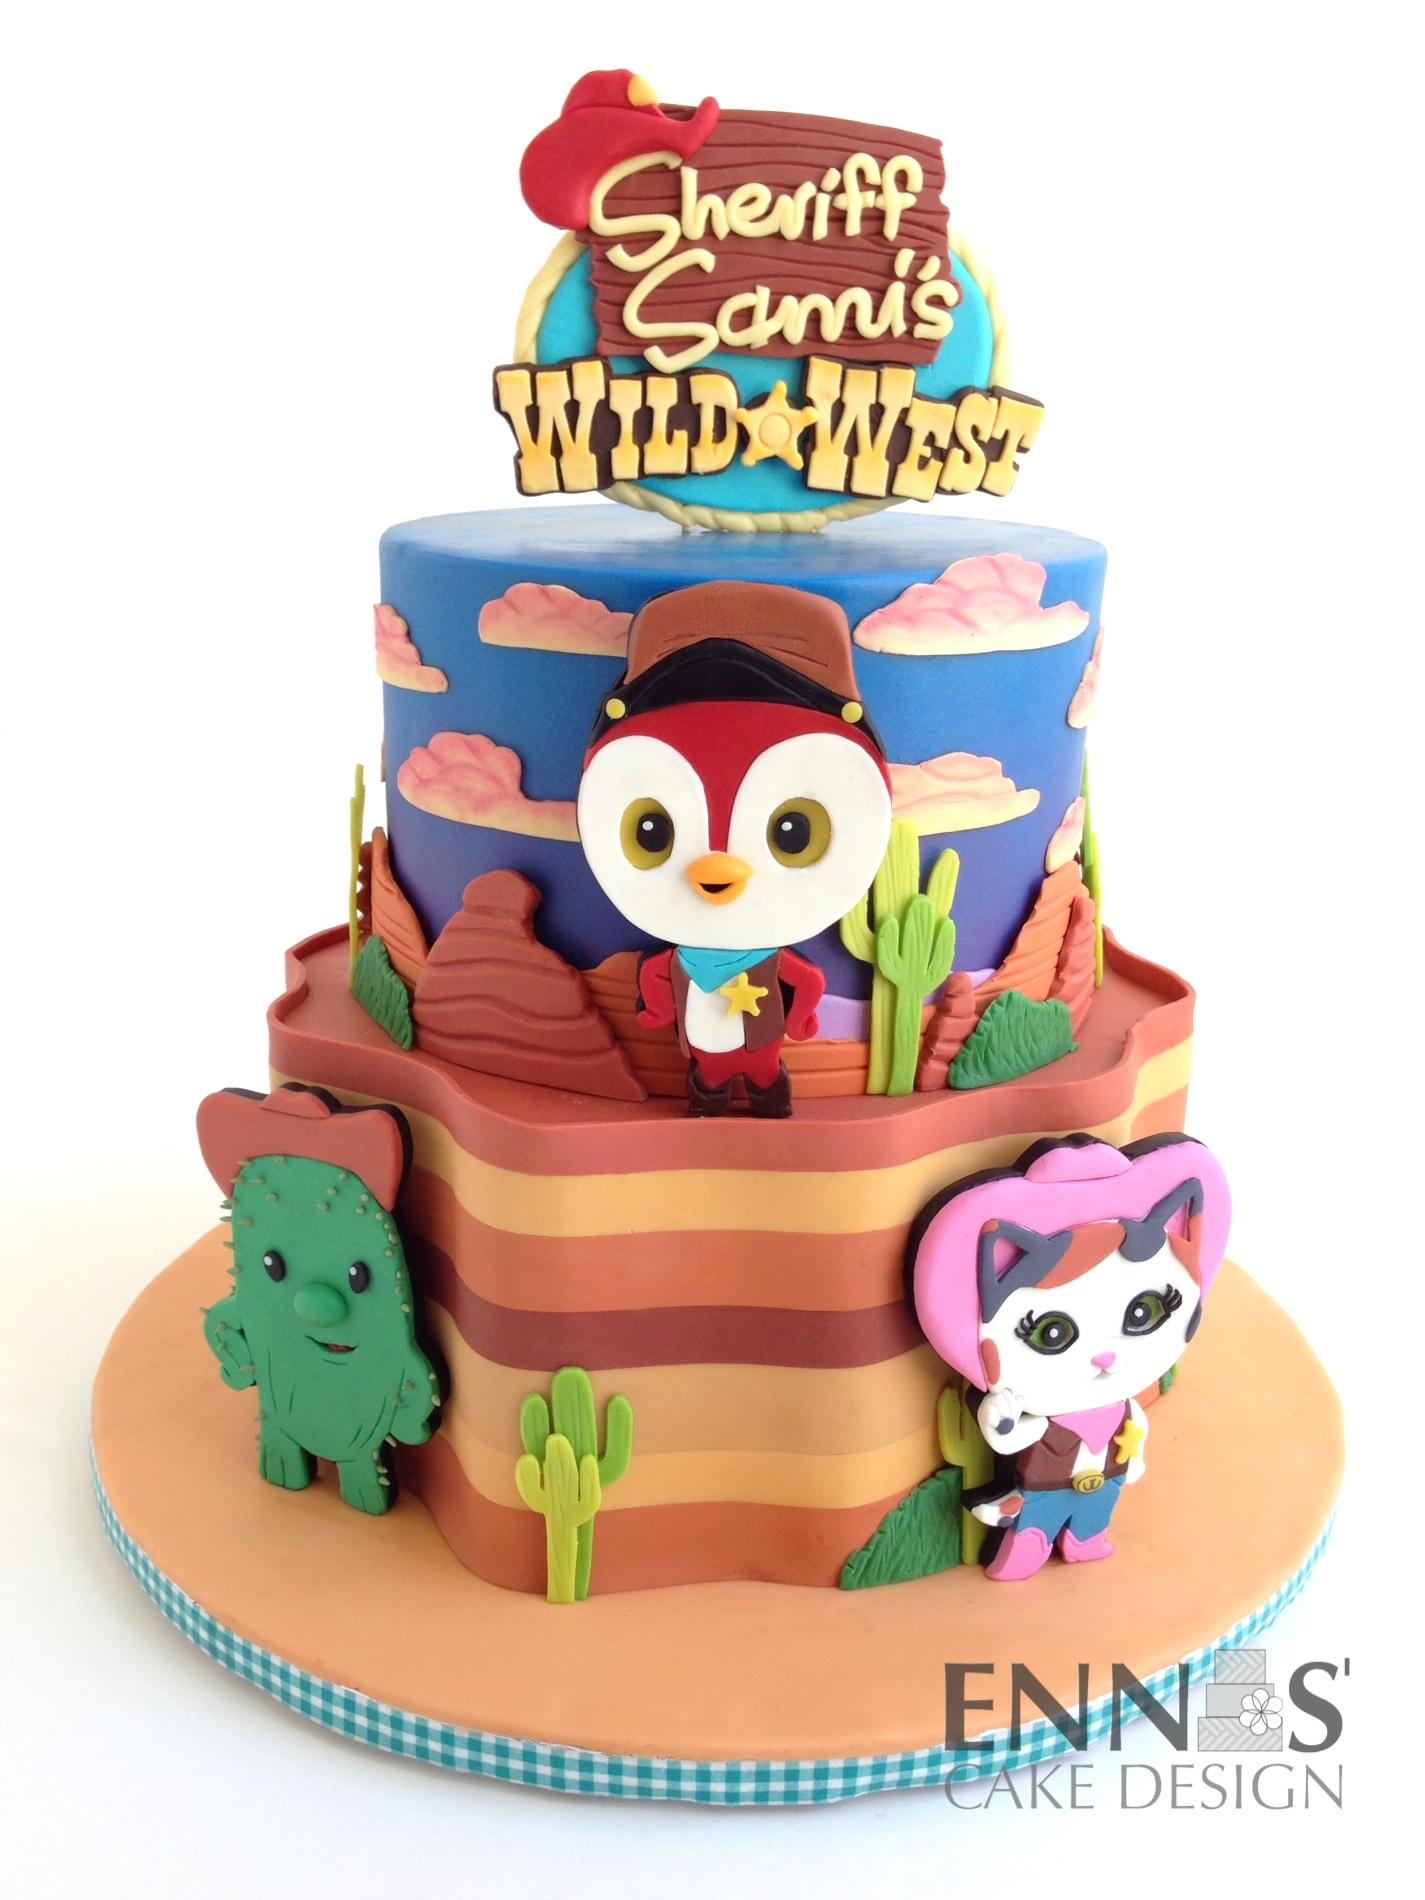 Sheriff-Callie-Cake.jpg